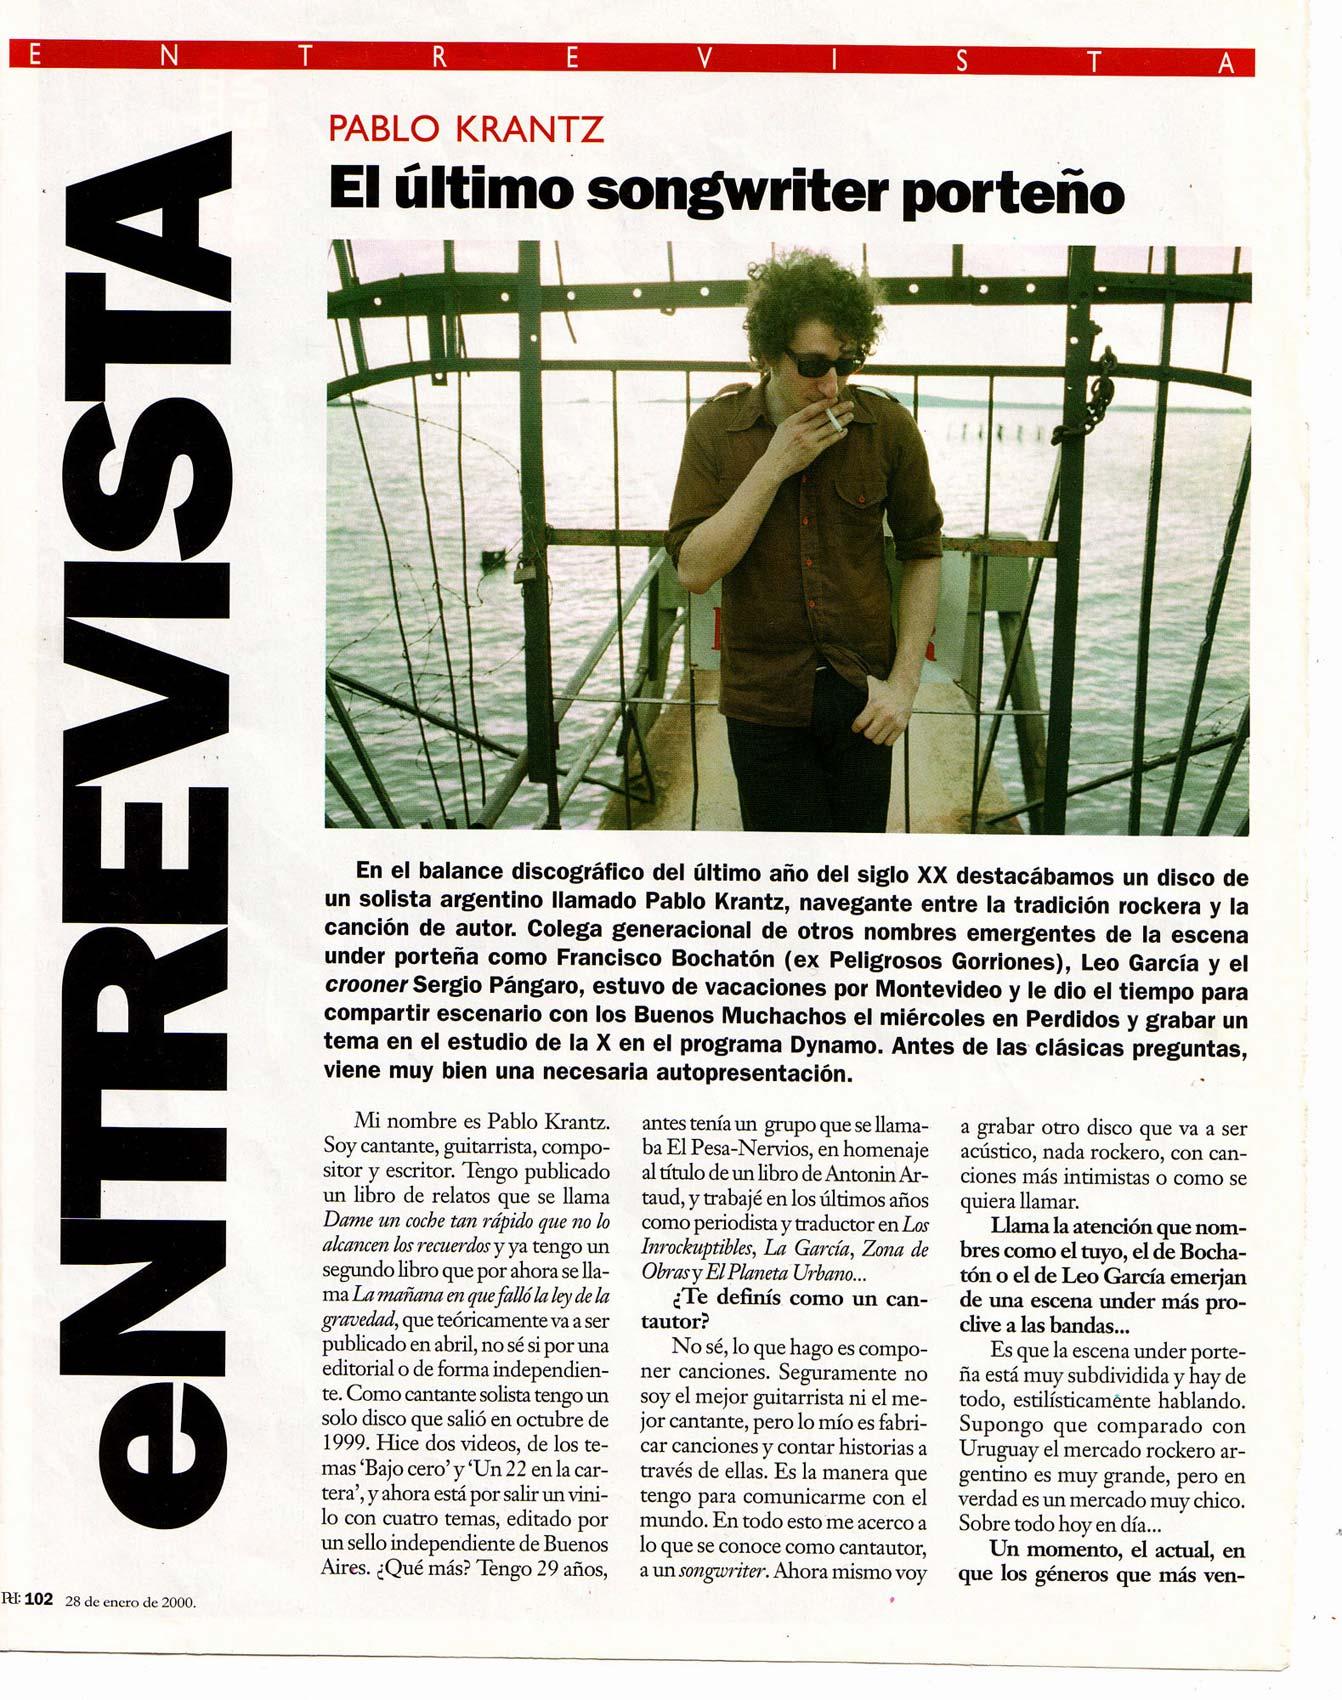 Revista Posdata, Uruguay, 2000